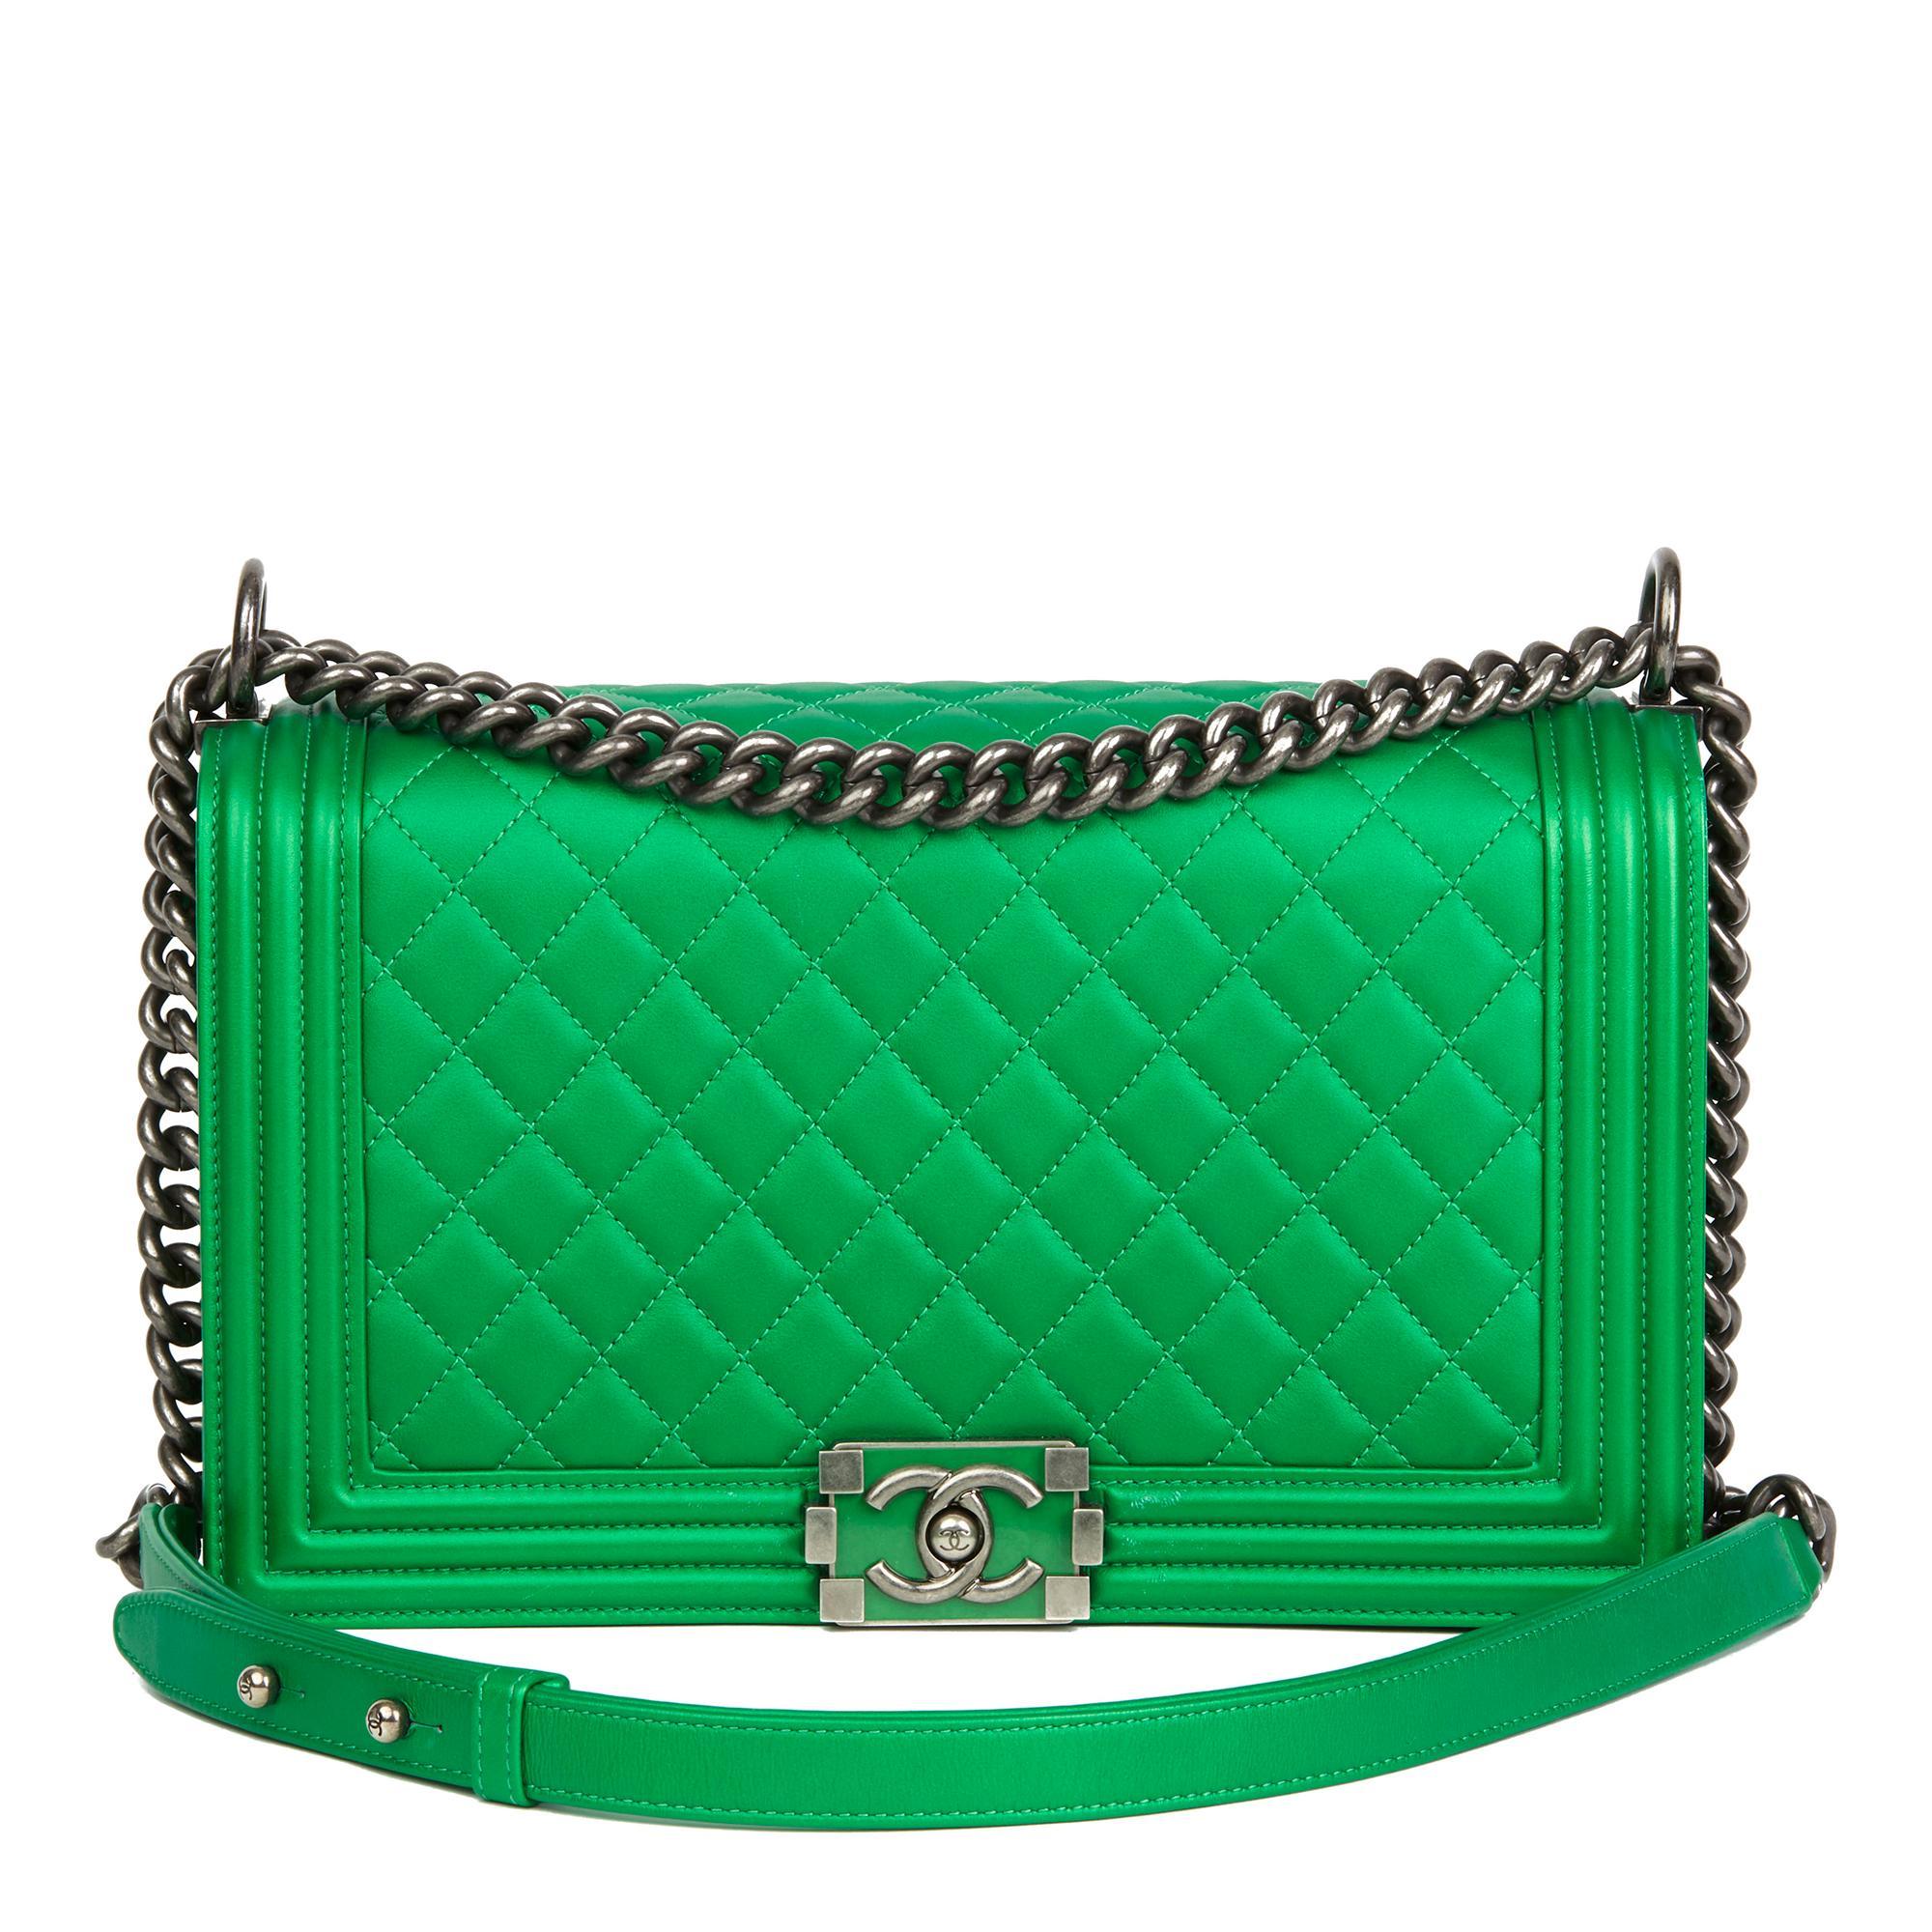 c2e6b13b9caa Chanel Boy Bags - 256 For Sale on 1stdibs